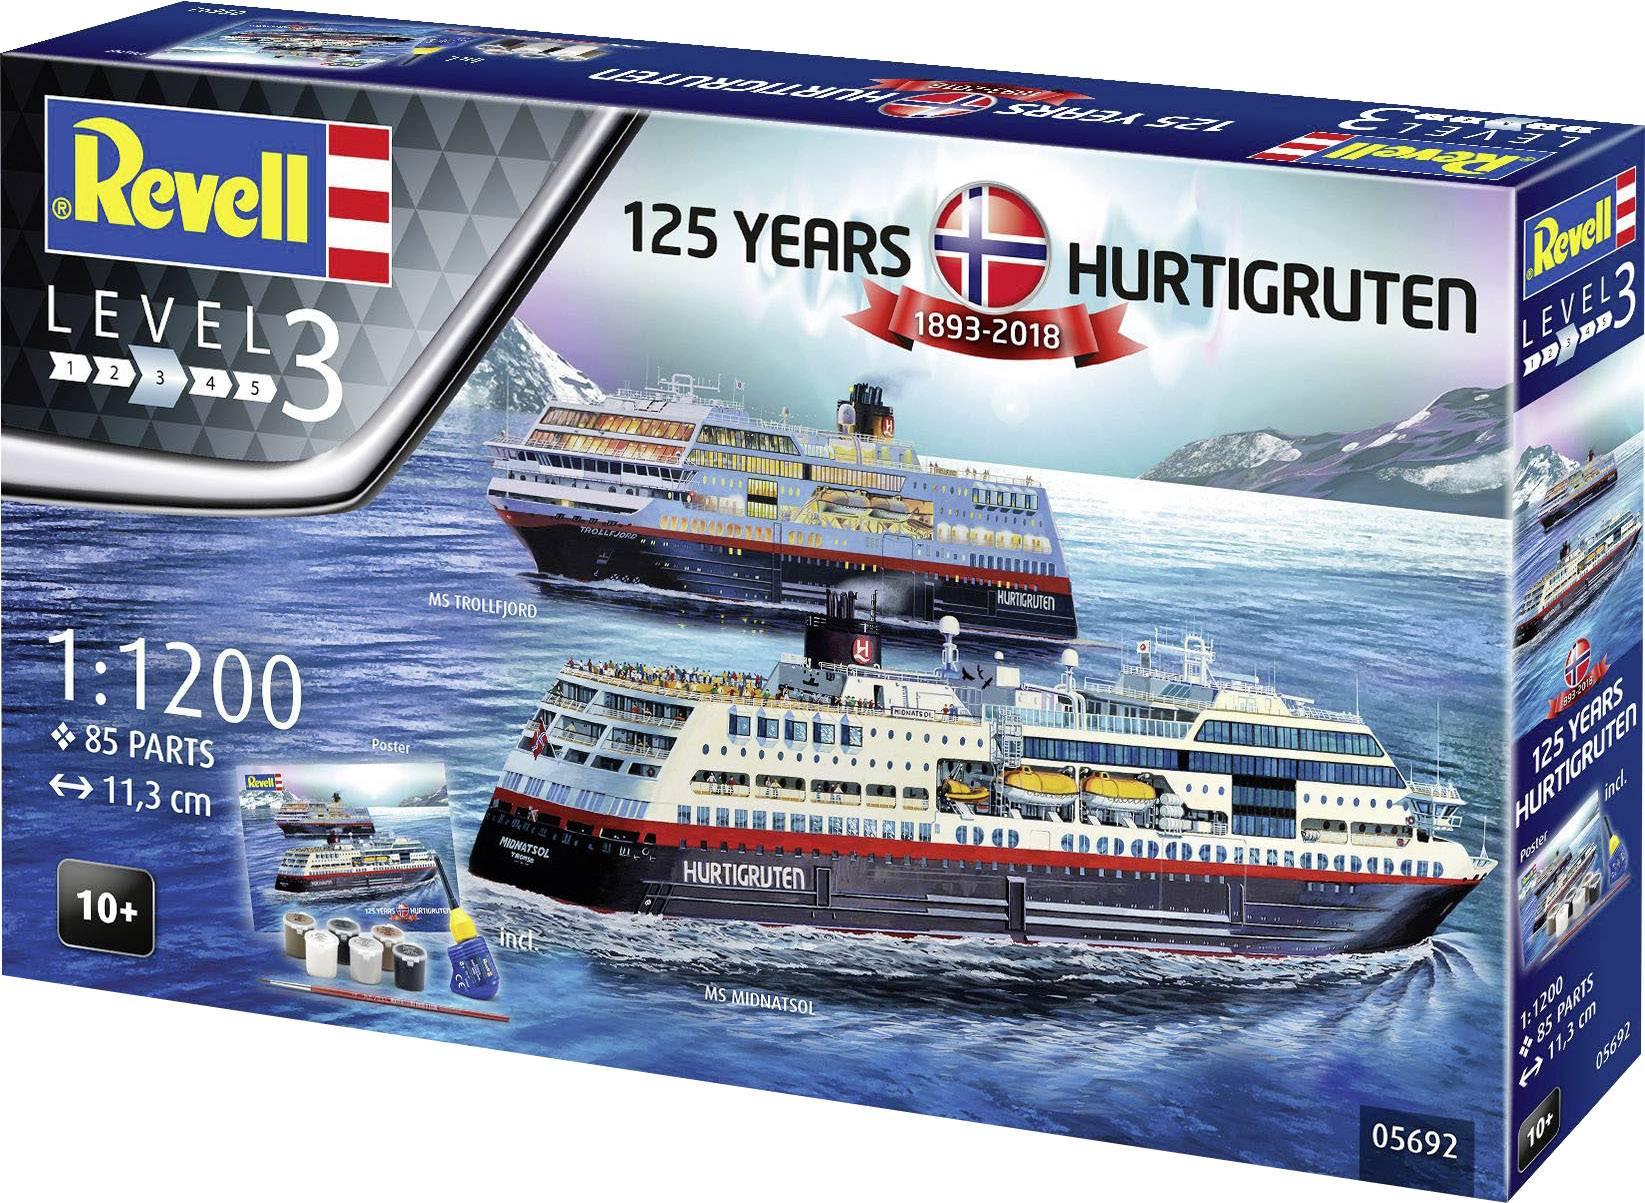 Ship Model Kit 05692 Scale 1:1200 Revell Hurtigruten 125th Anniversary